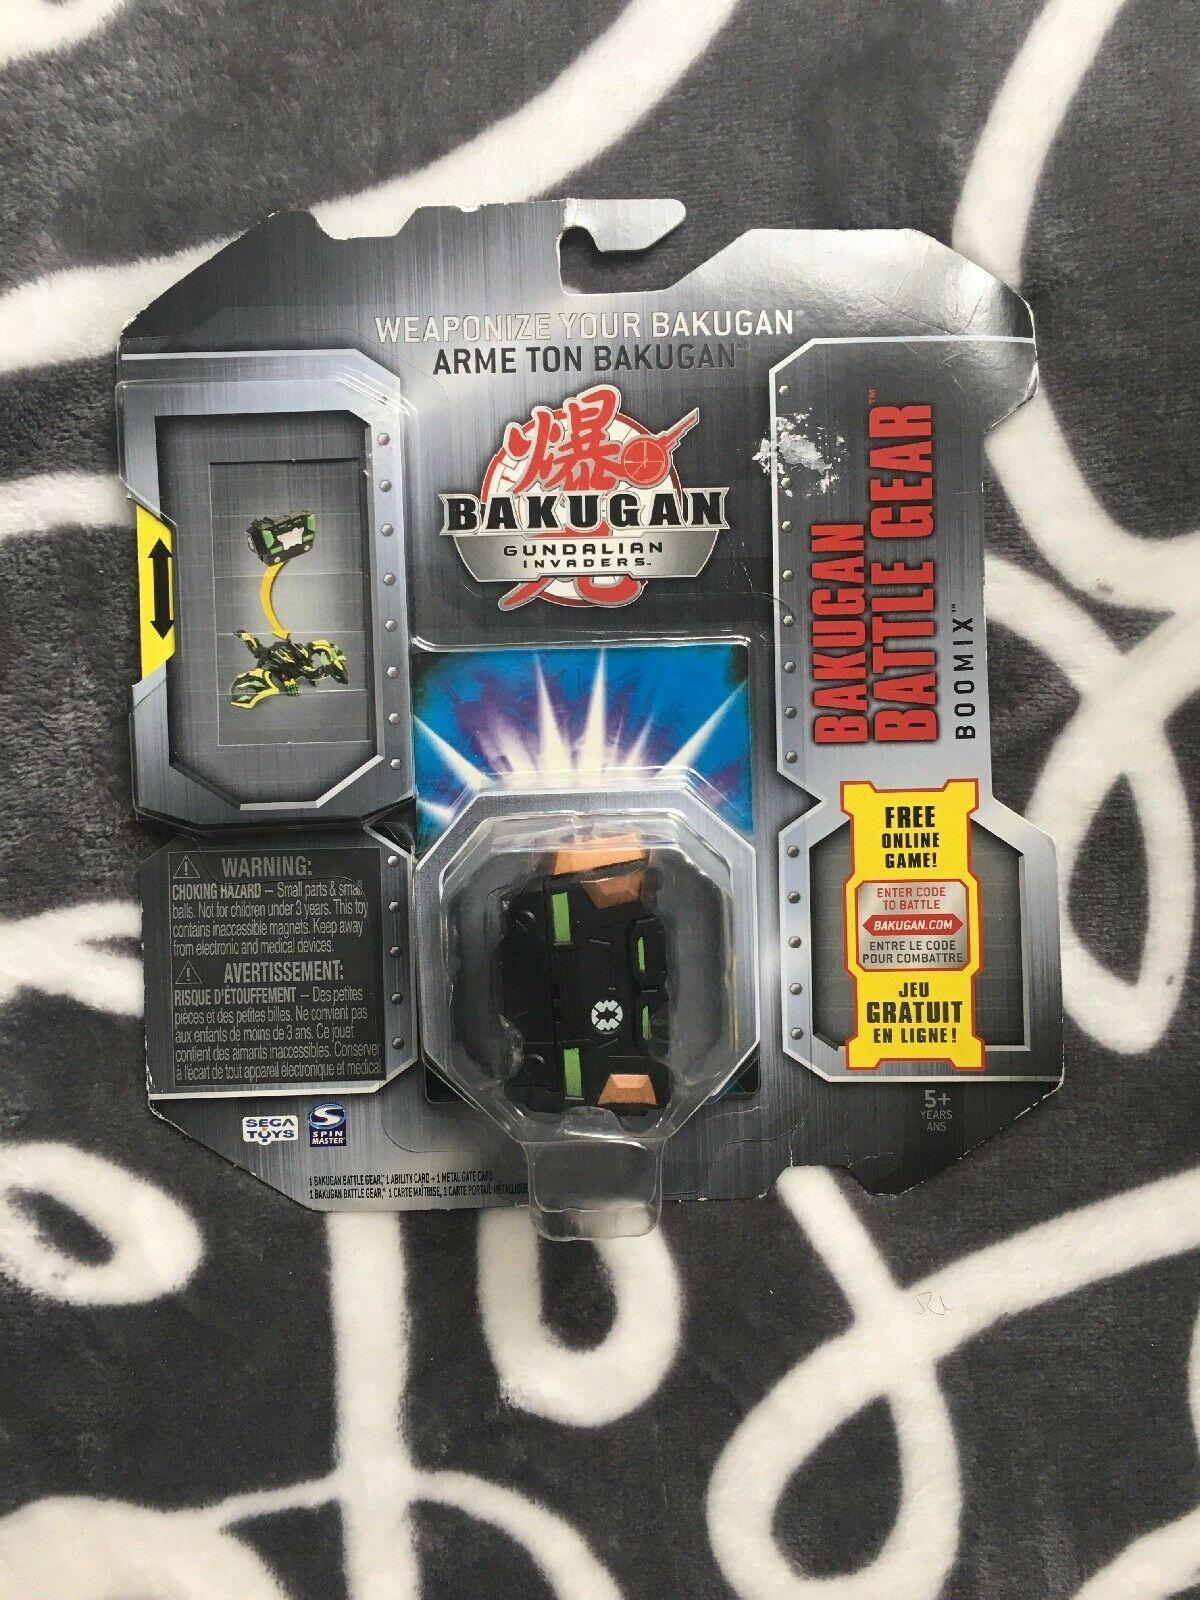 Bakugan Gundalian Invaders Battle Gear Copper Boomix 2009 avec Jeu Memory En Ligne